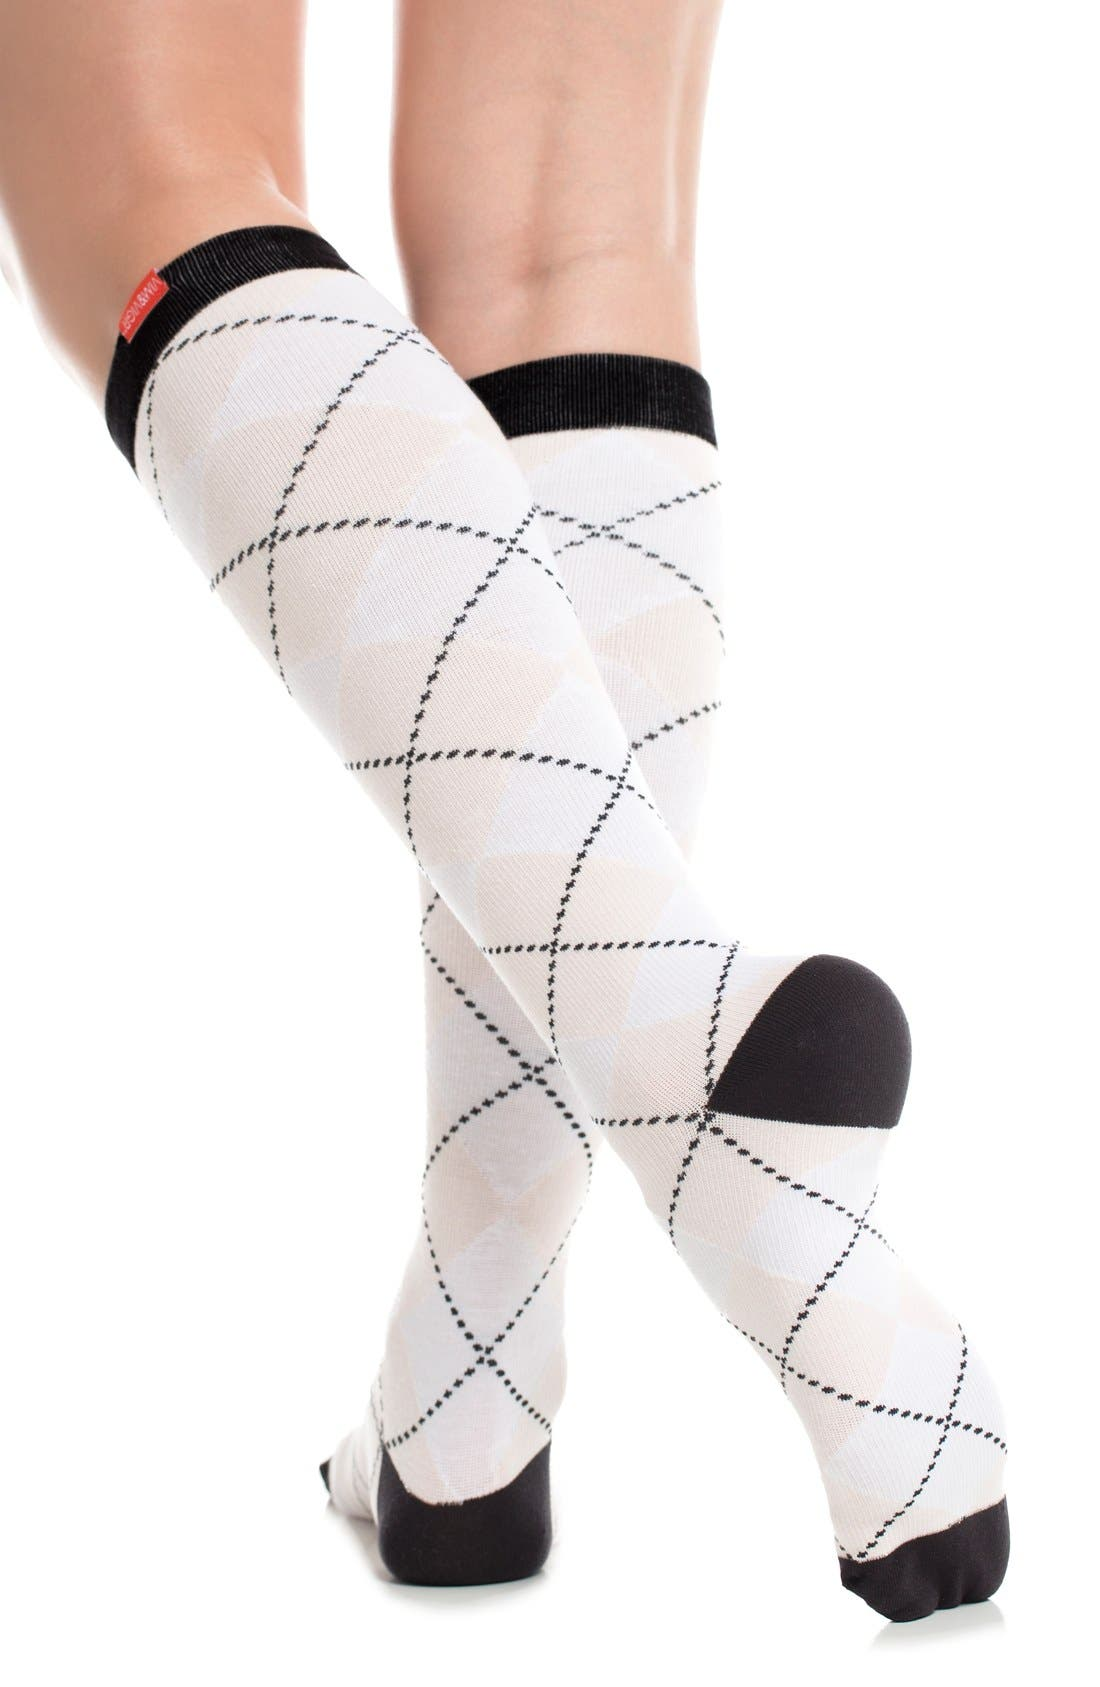 Argyle Graduated Compression Trouser Socks,                             Alternate thumbnail 3, color,                             White/ Blush